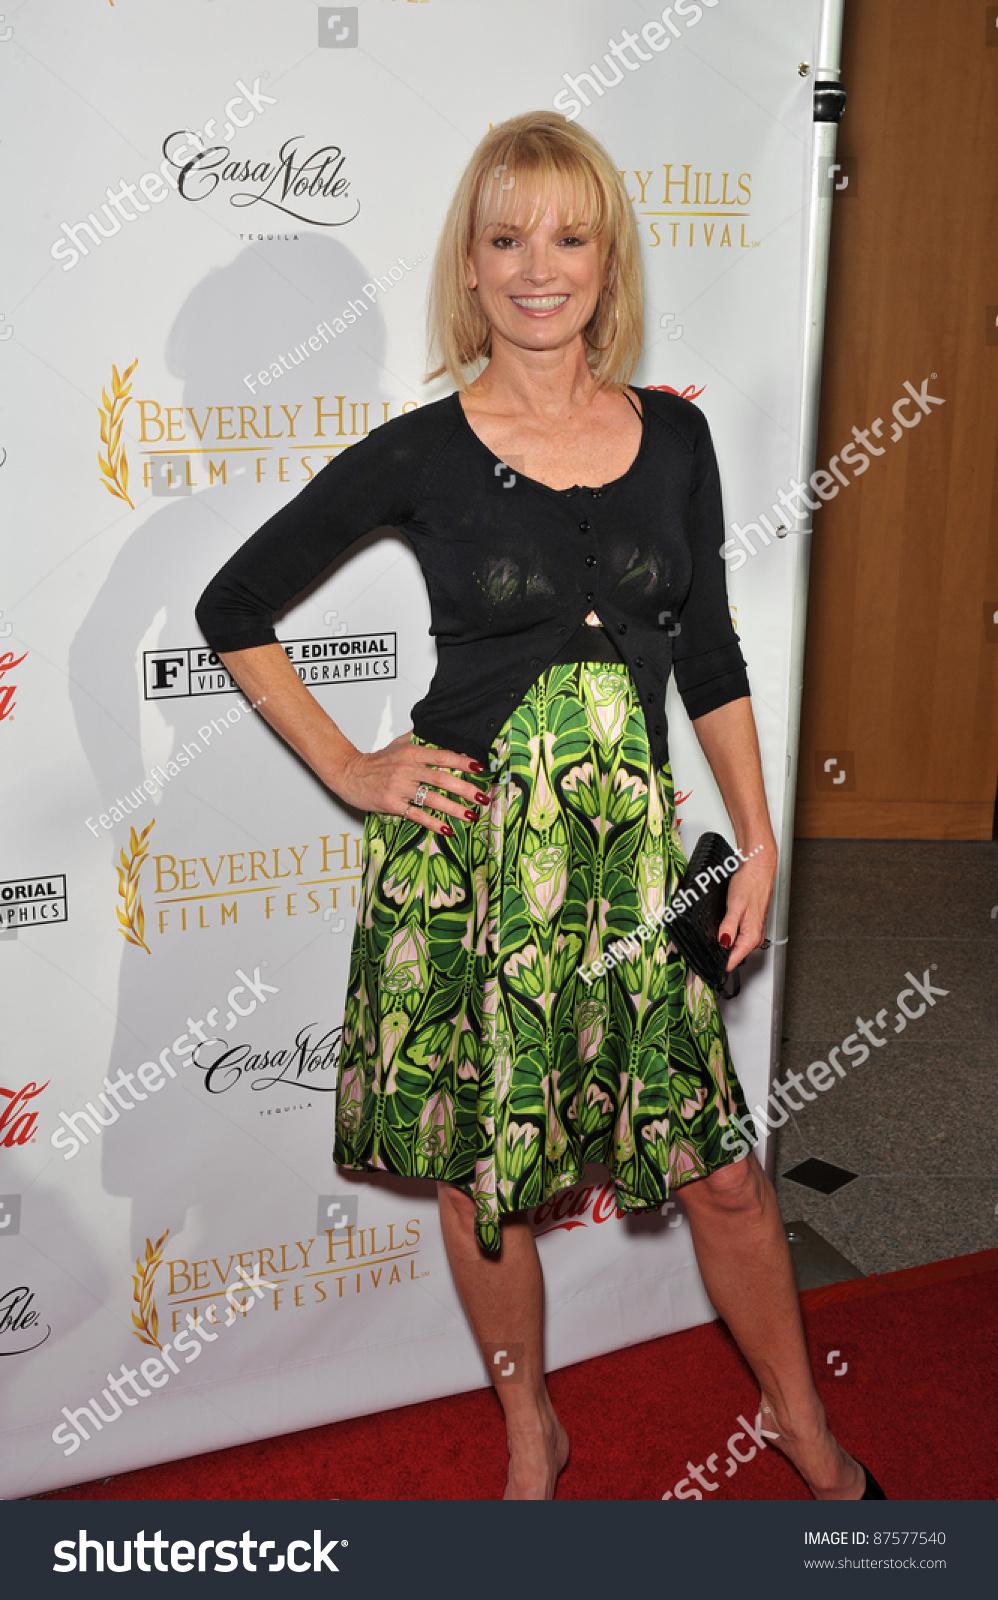 Peyton List (actress, born 1998),Jane Lapotaire (born 1944) Sex tube Hilda Braid,Chloe East